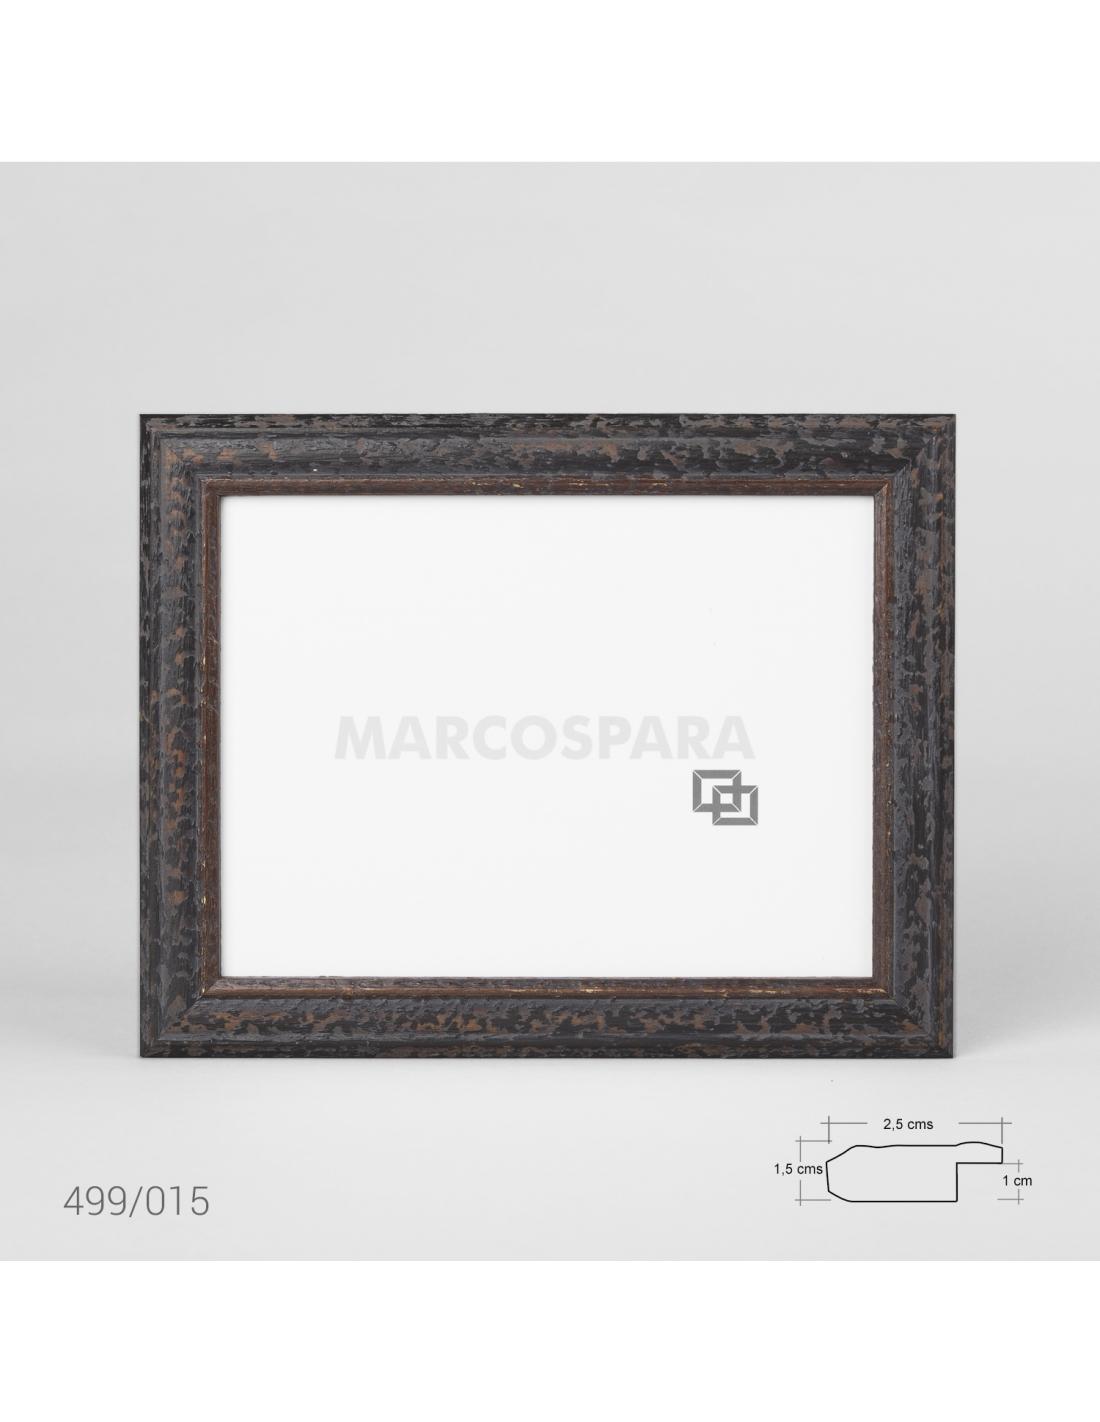 Marcos de madera para posters M499